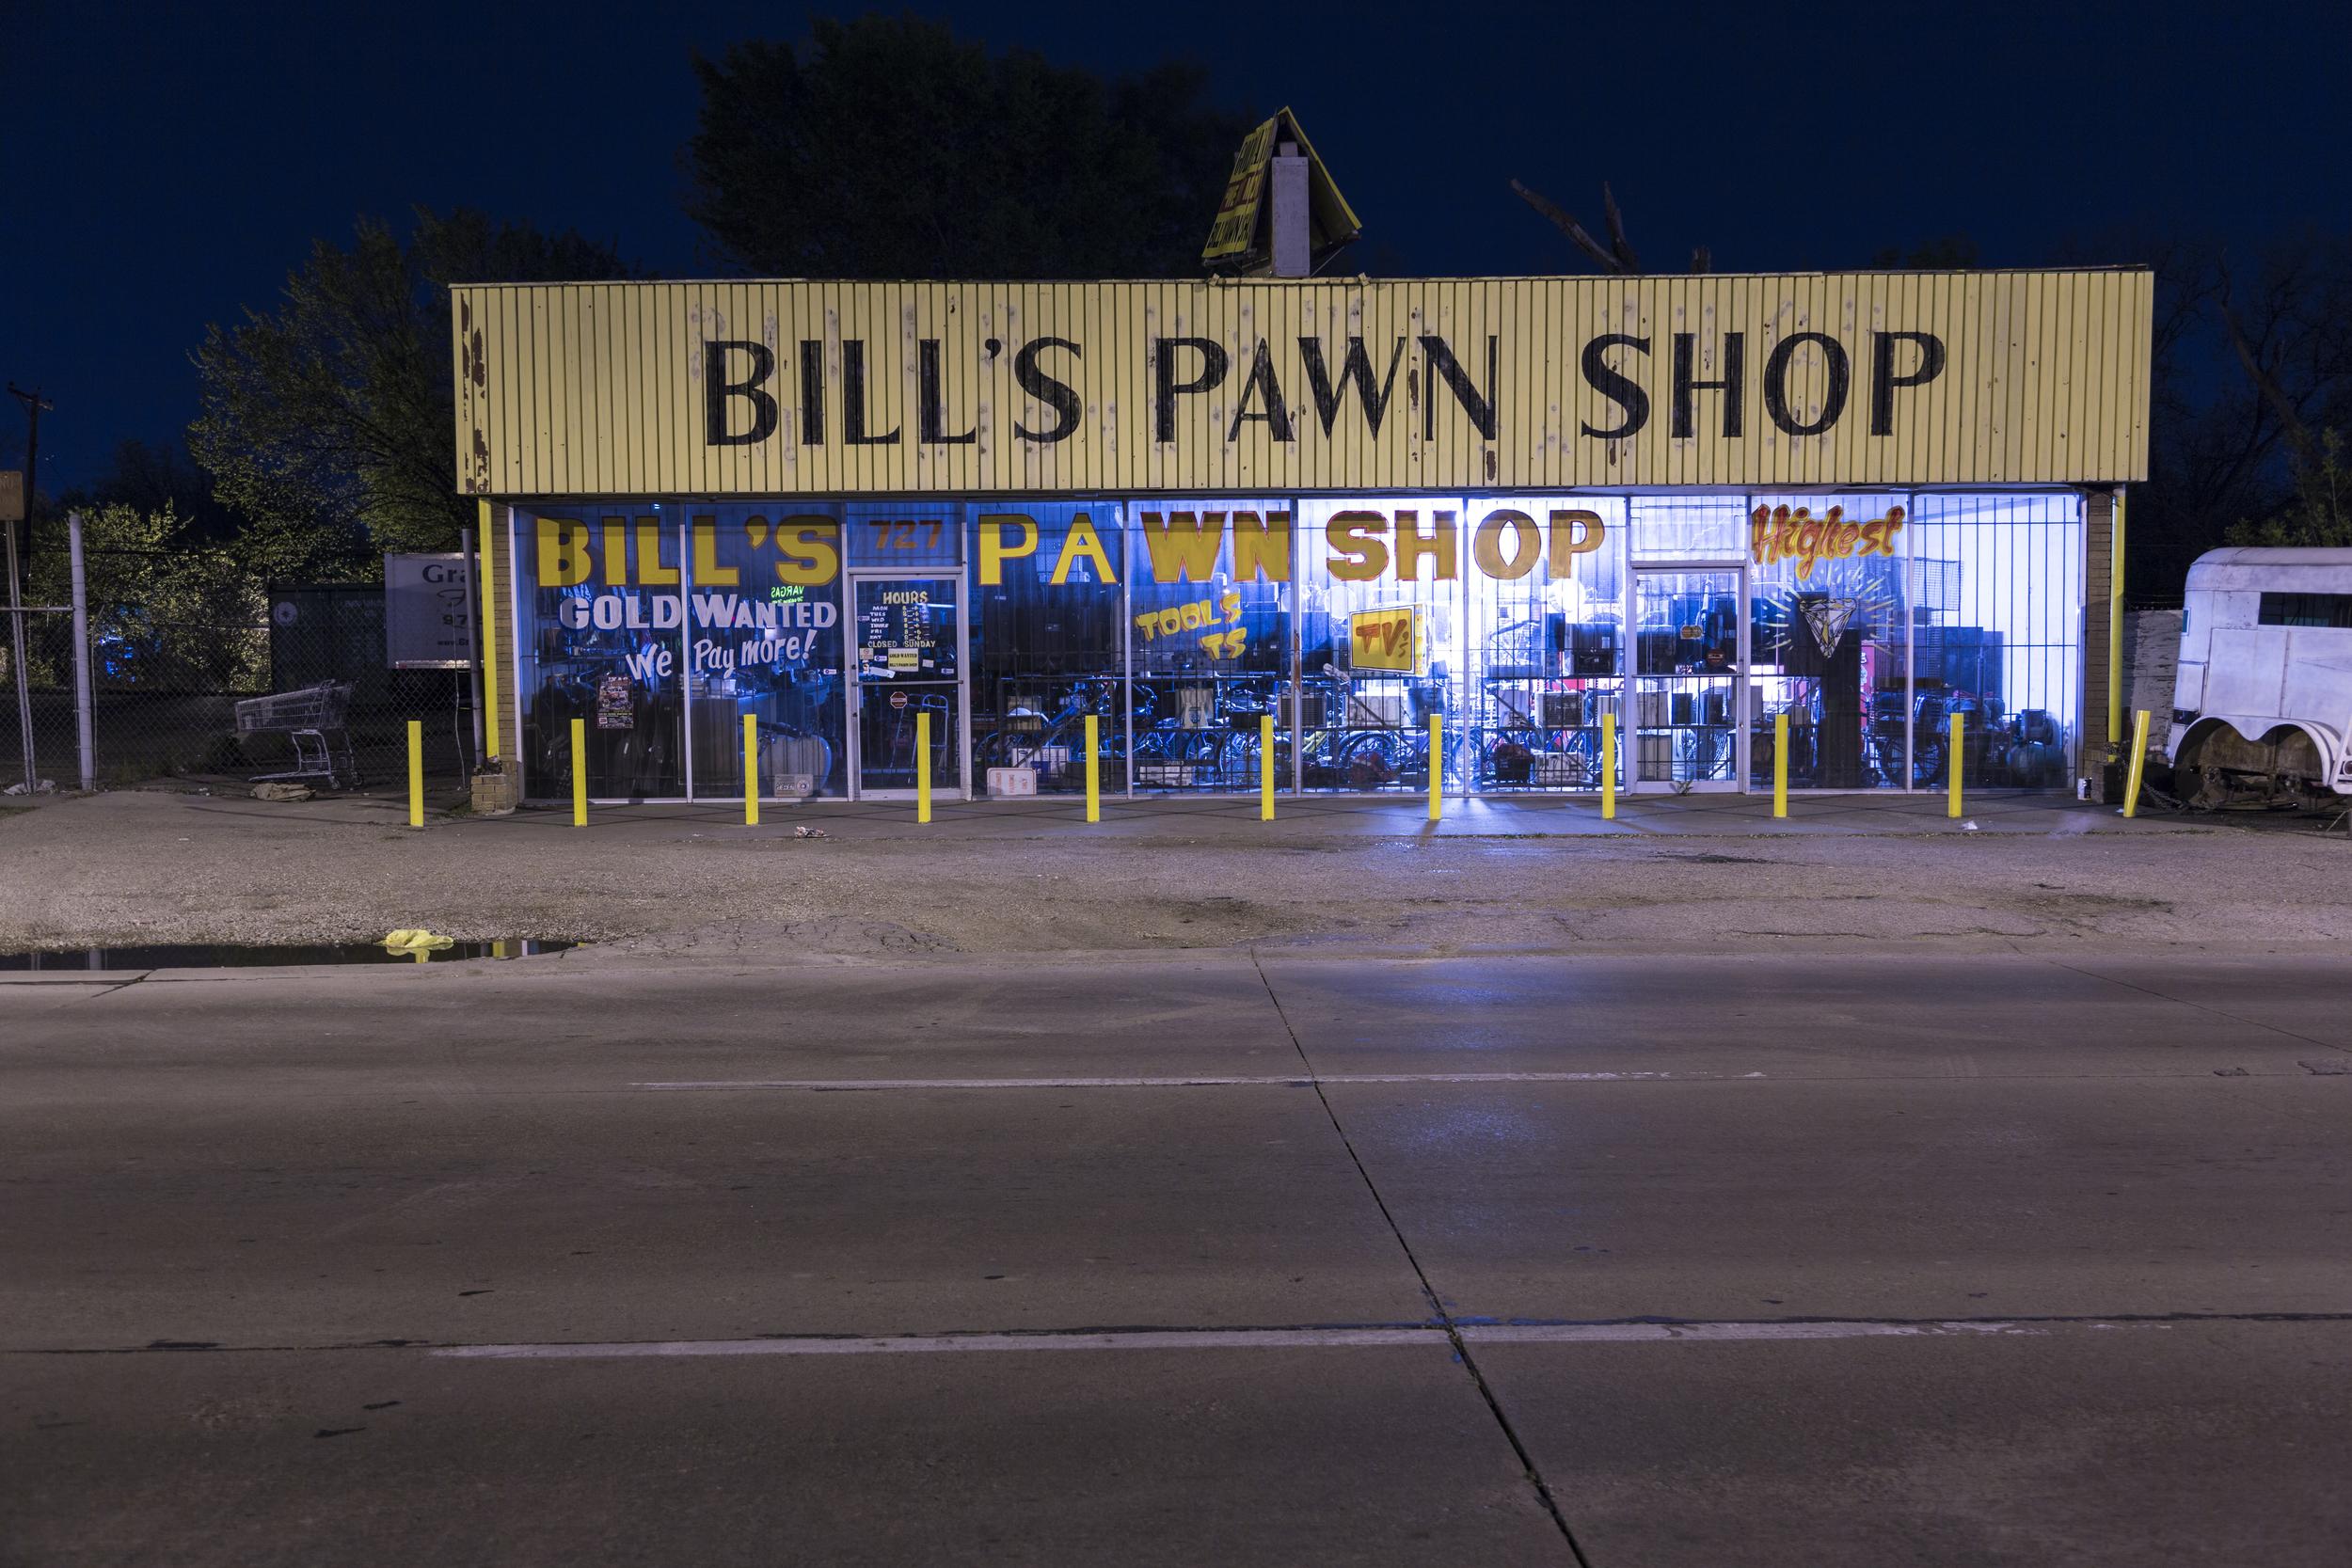 Pawn Shop Series - Bill's Pawn Shop